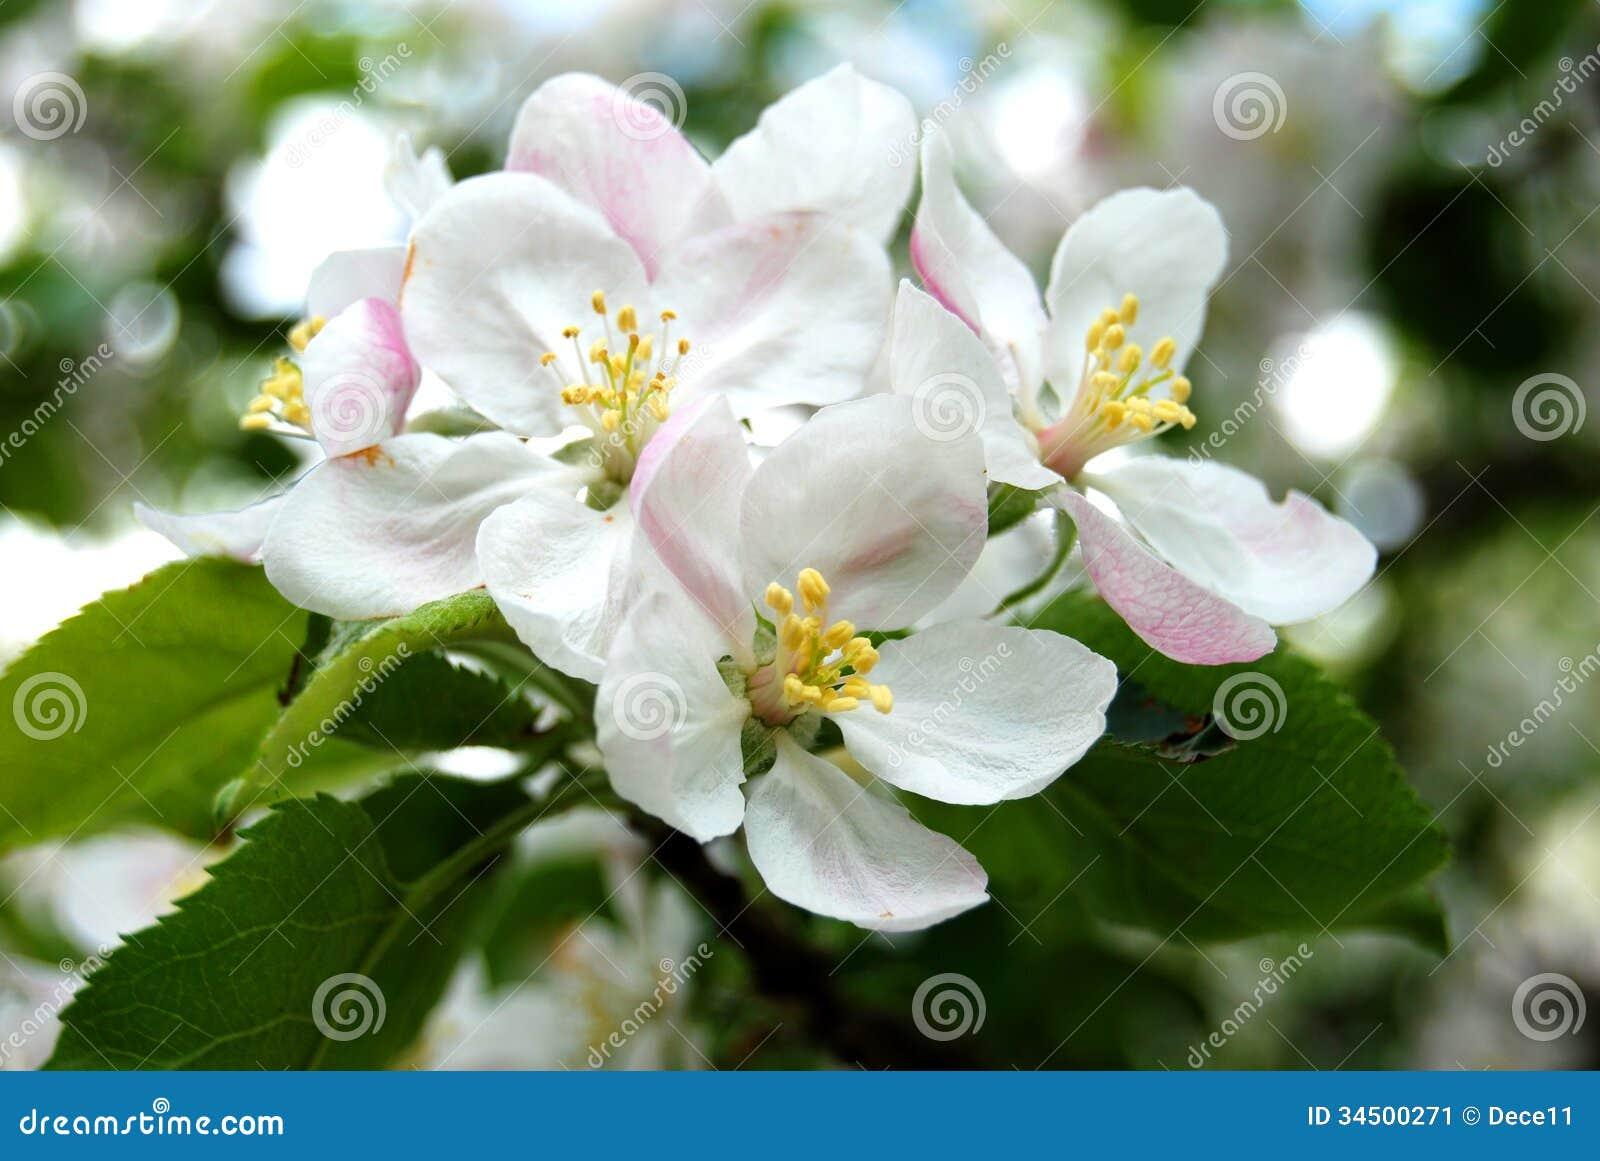 Apple Tree Flower Stock Image - Image: 34500271